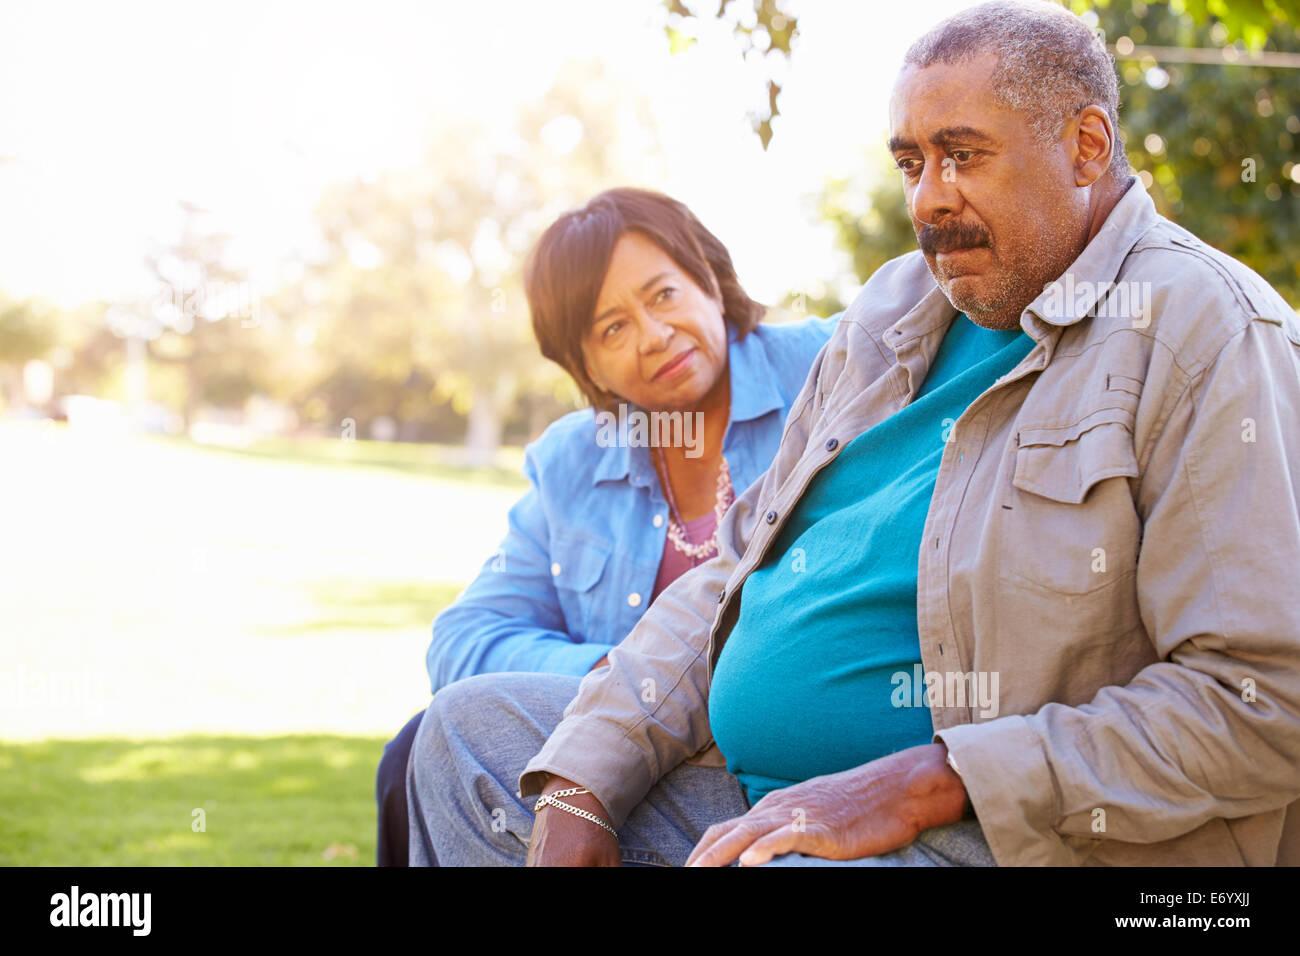 Senior Woman Comforting Unhappy Senior Husband Outdoors - Stock Image